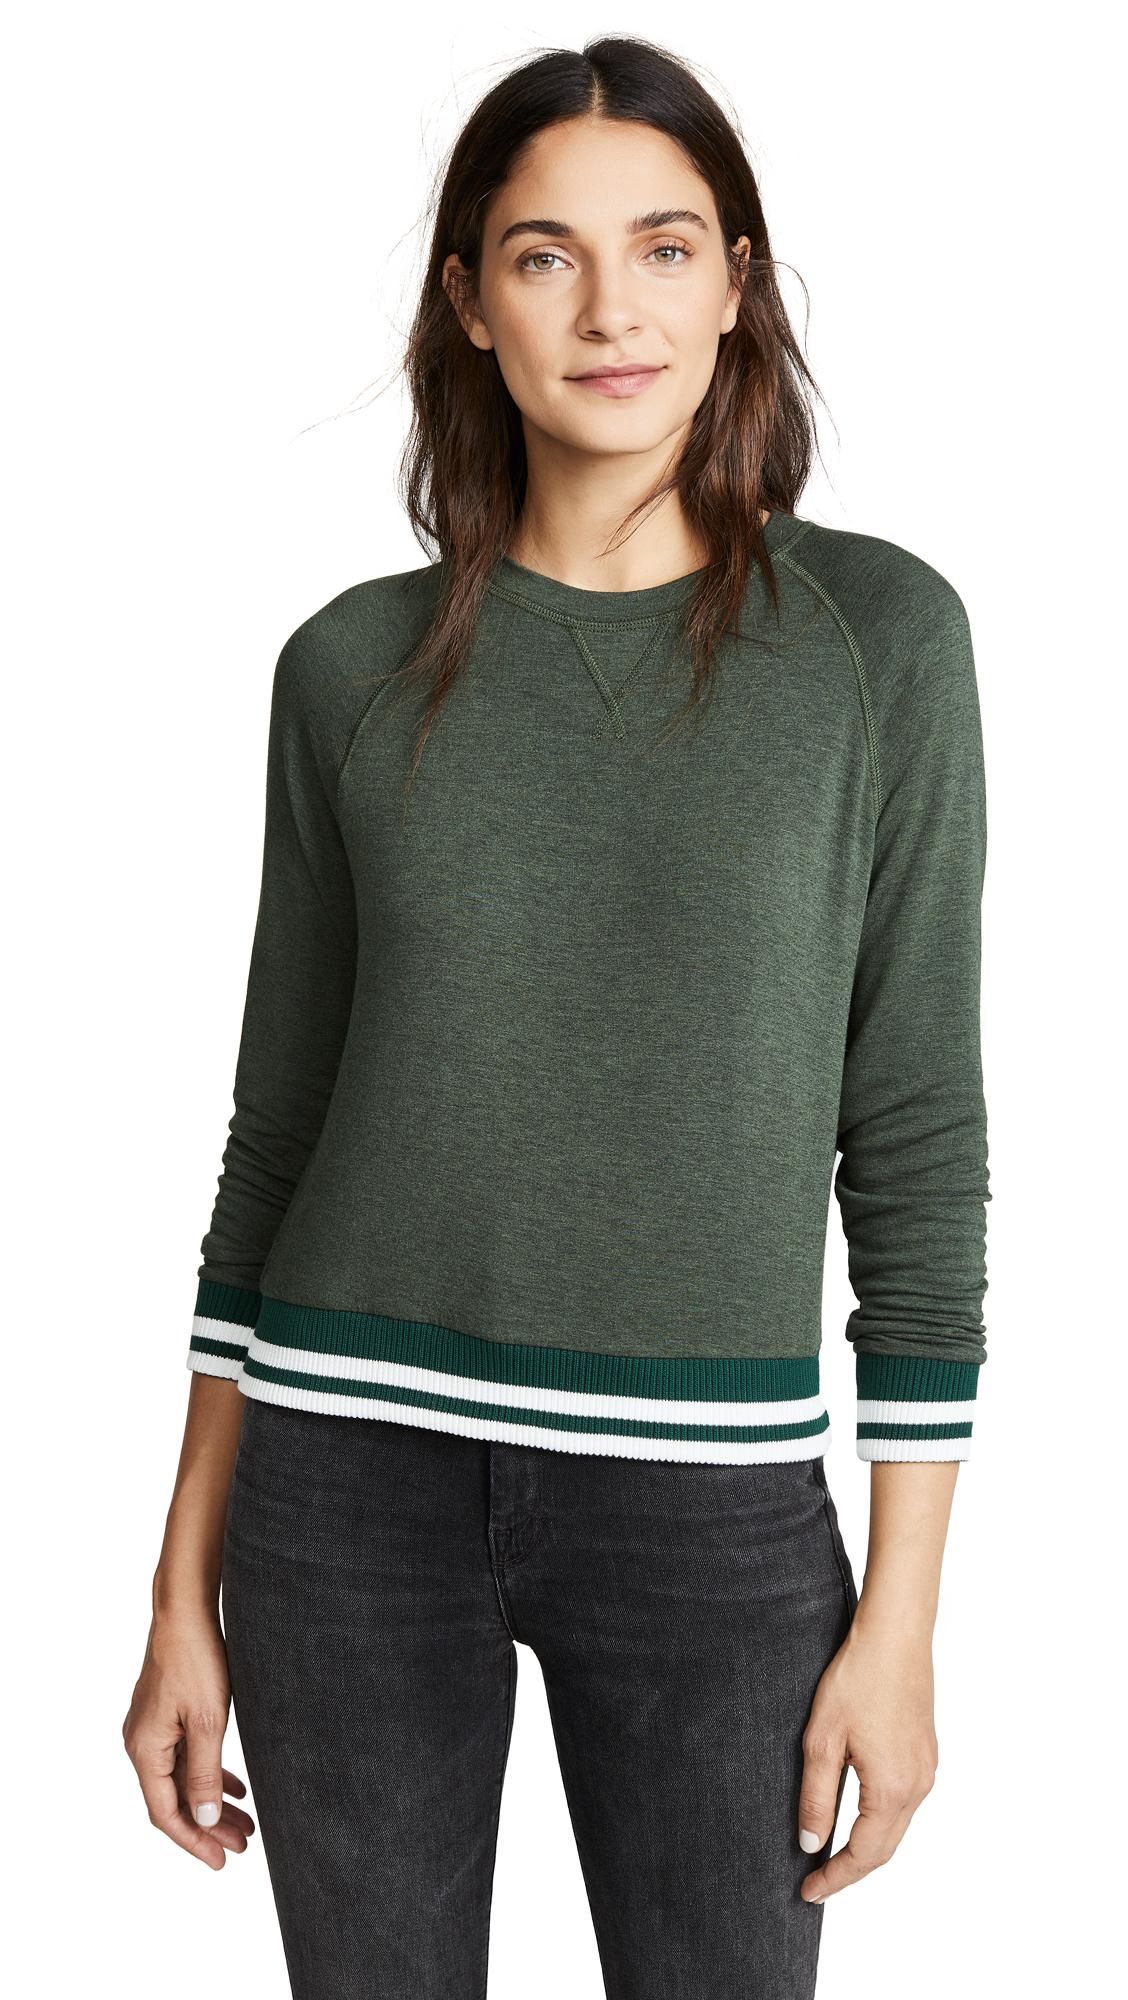 LNA Roller Coaster Sweatshirt In Heather Olive